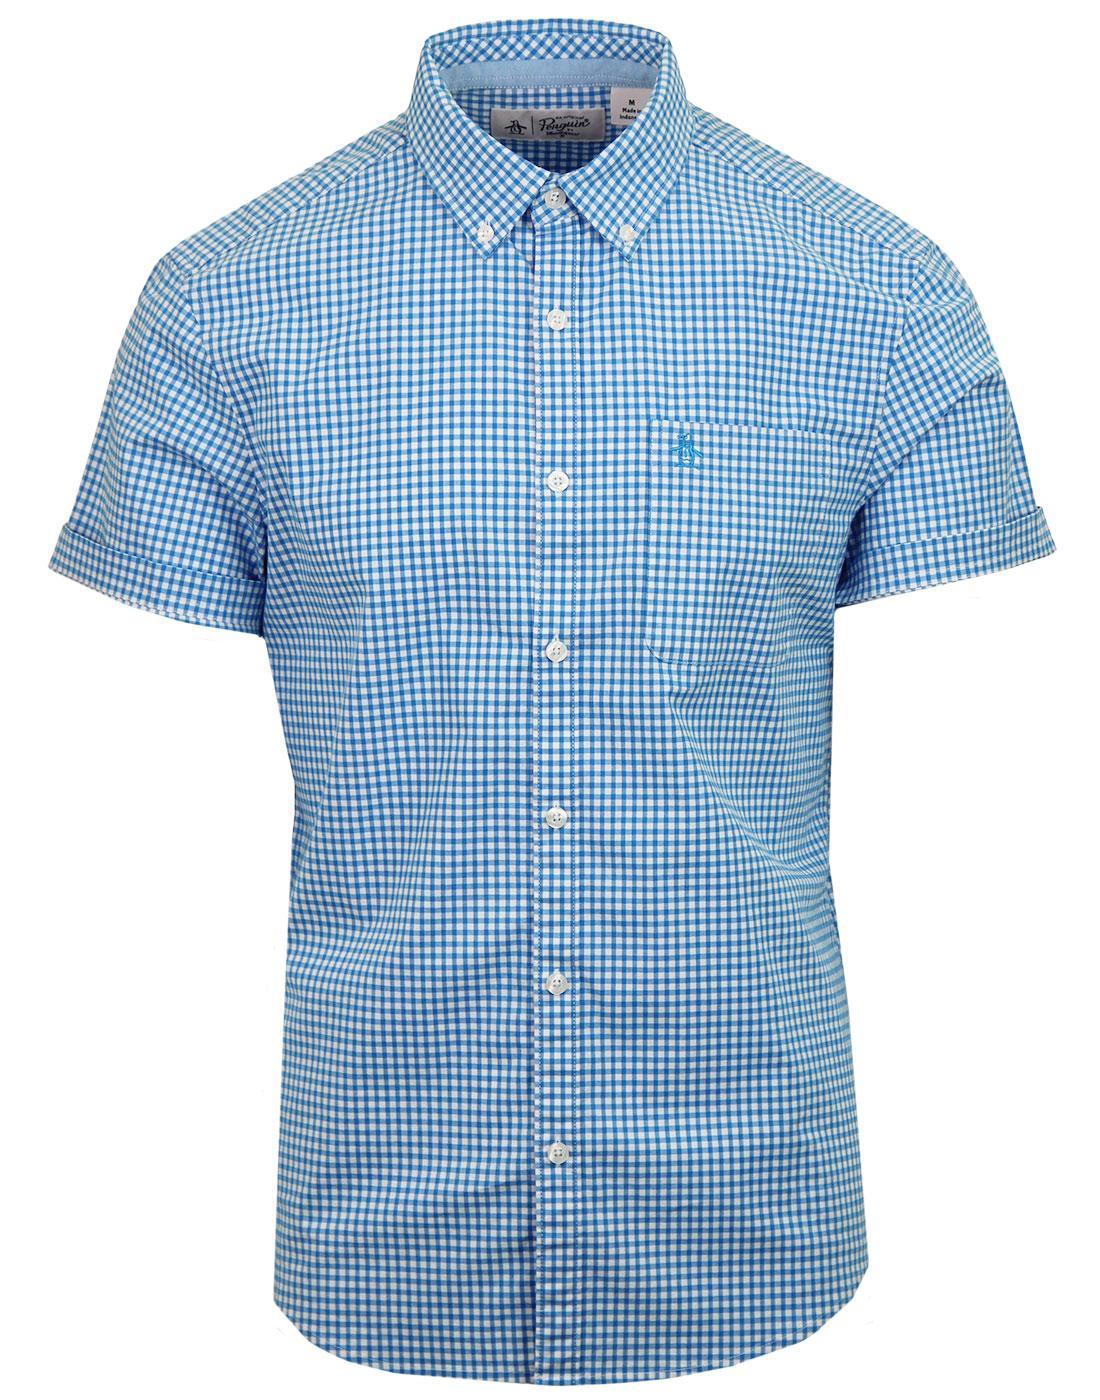 ORIGINAL PENGUIN Short Sleeve Gingham Shirt BLUE